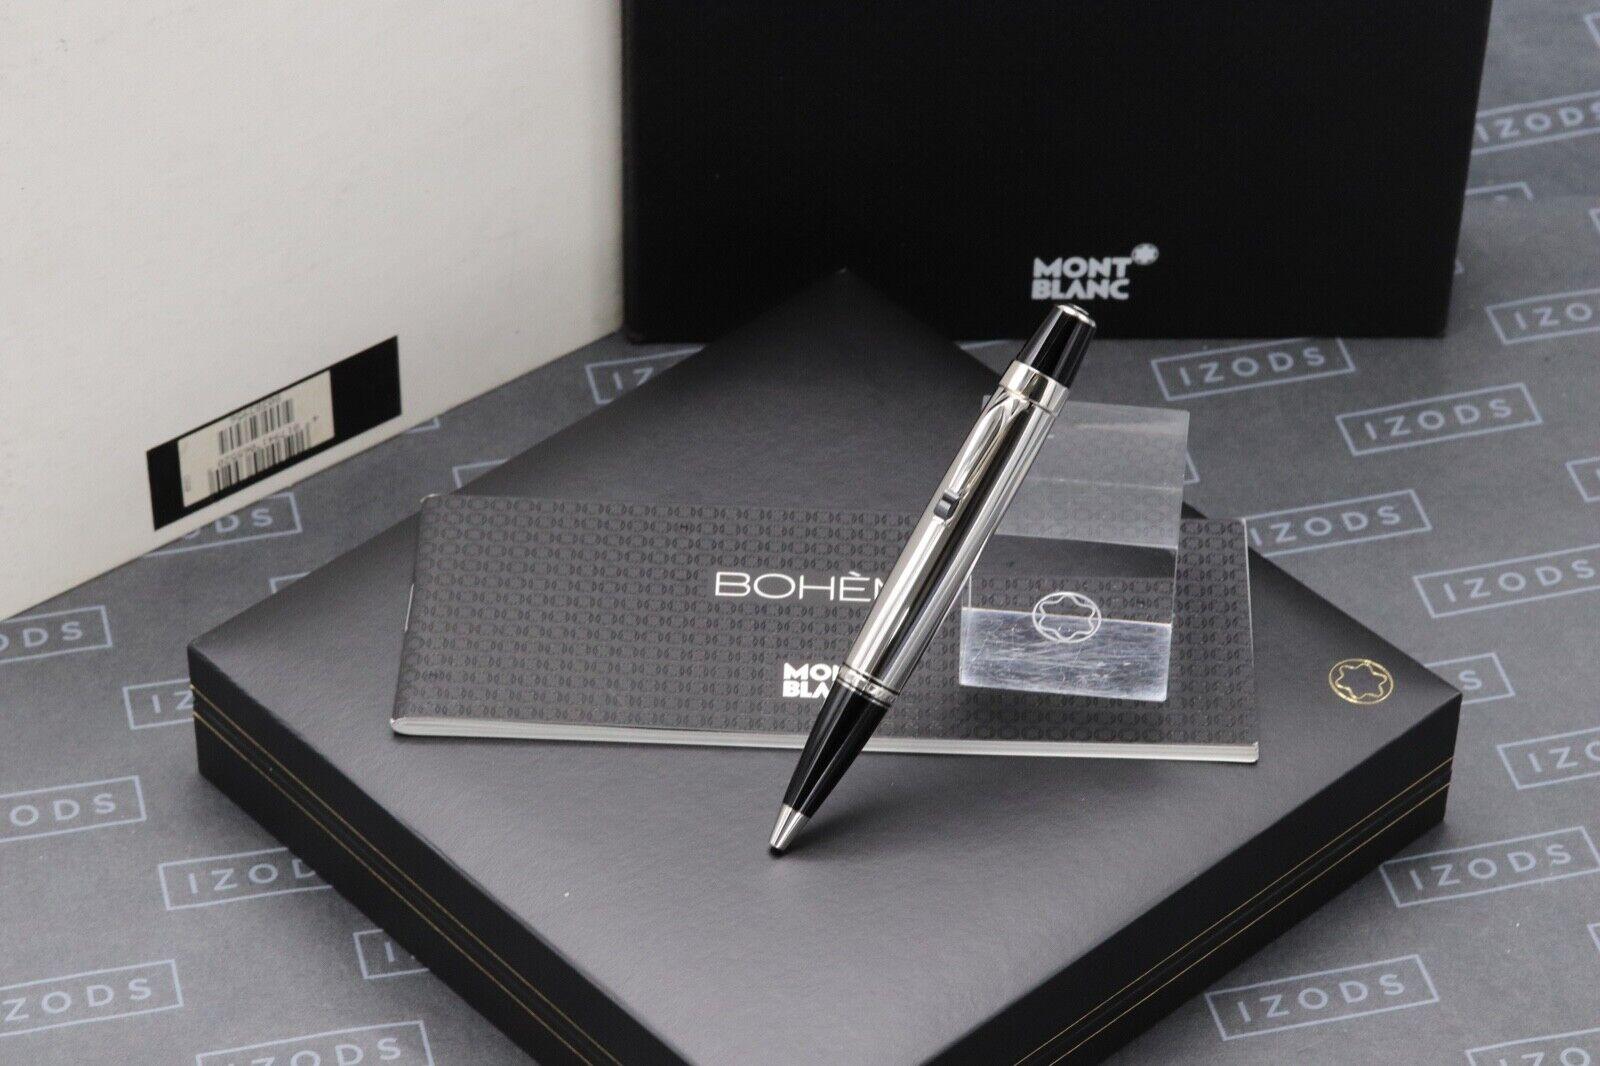 Montblanc Boheme Steel Noir Ballpoint Pen